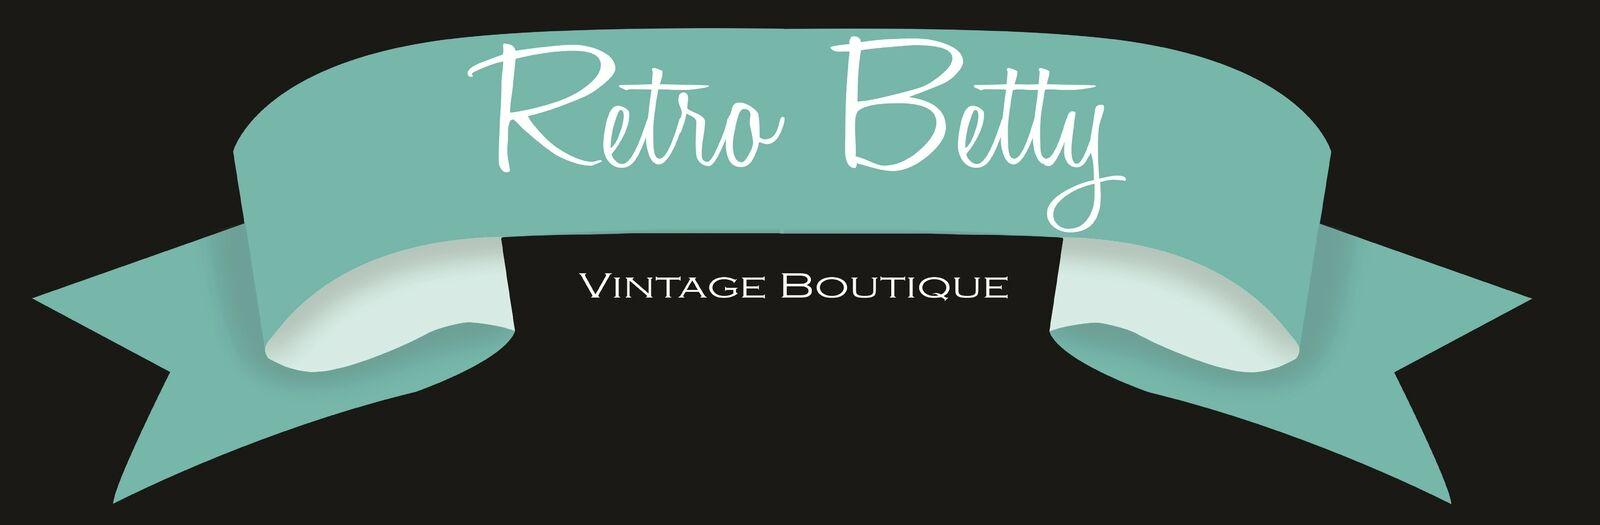 Retro Betty SLC